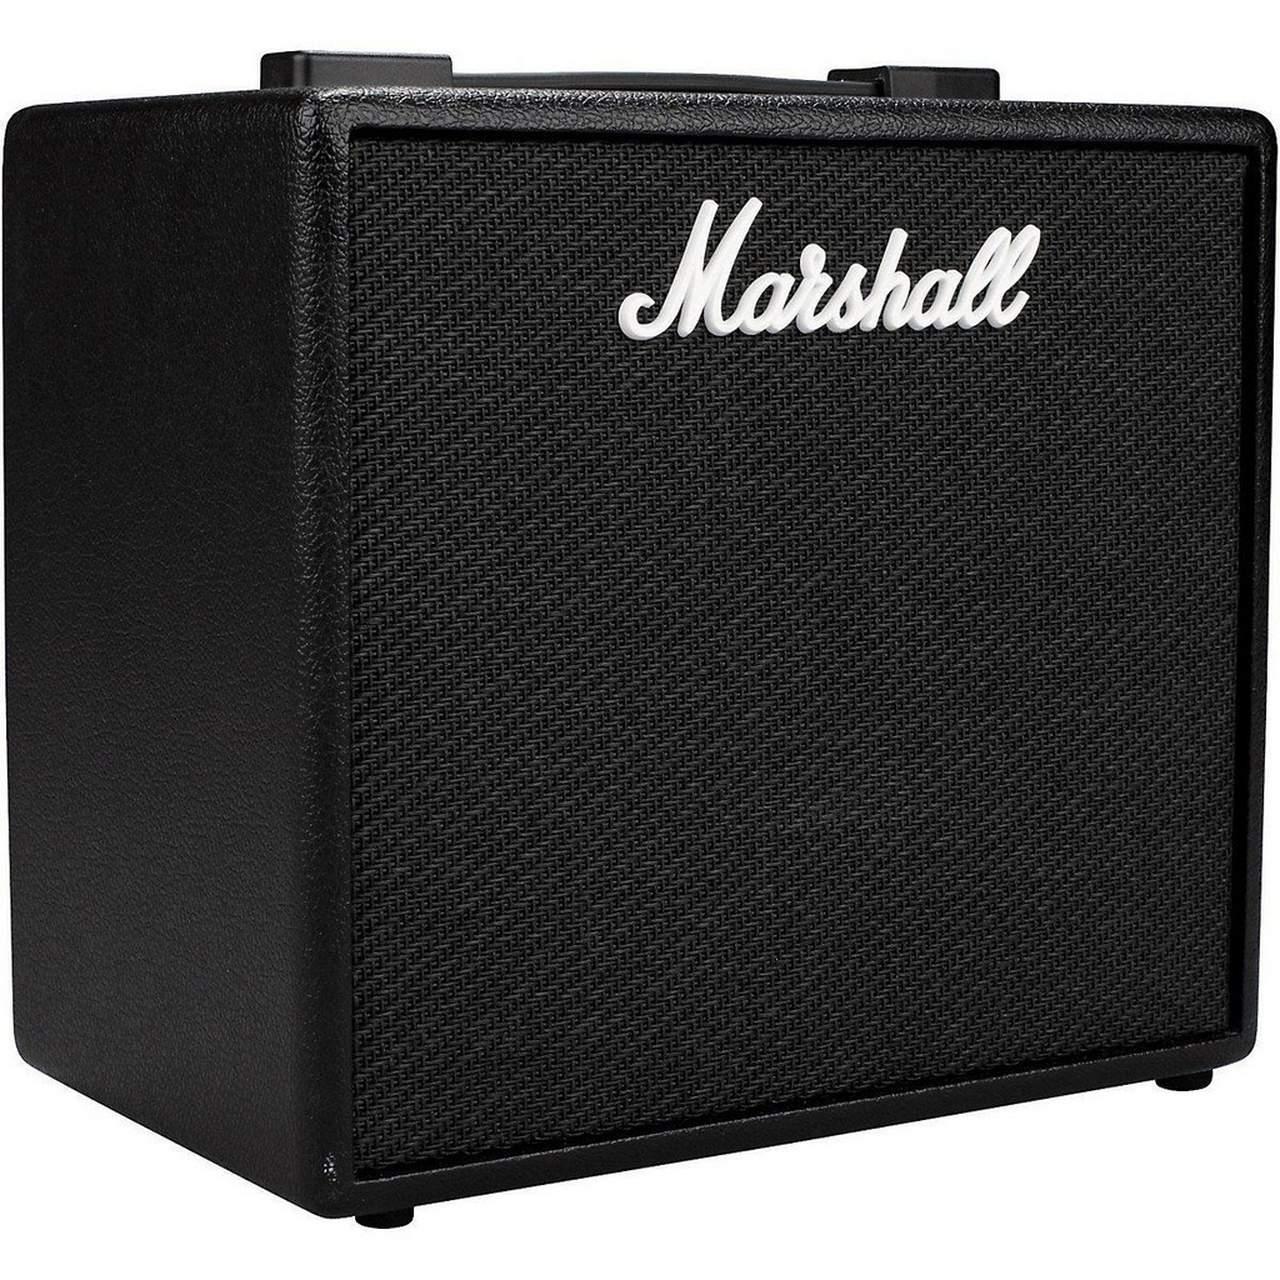 Caixa Amplificada Marshall CODE 25 25W 1x10 para Guitarra